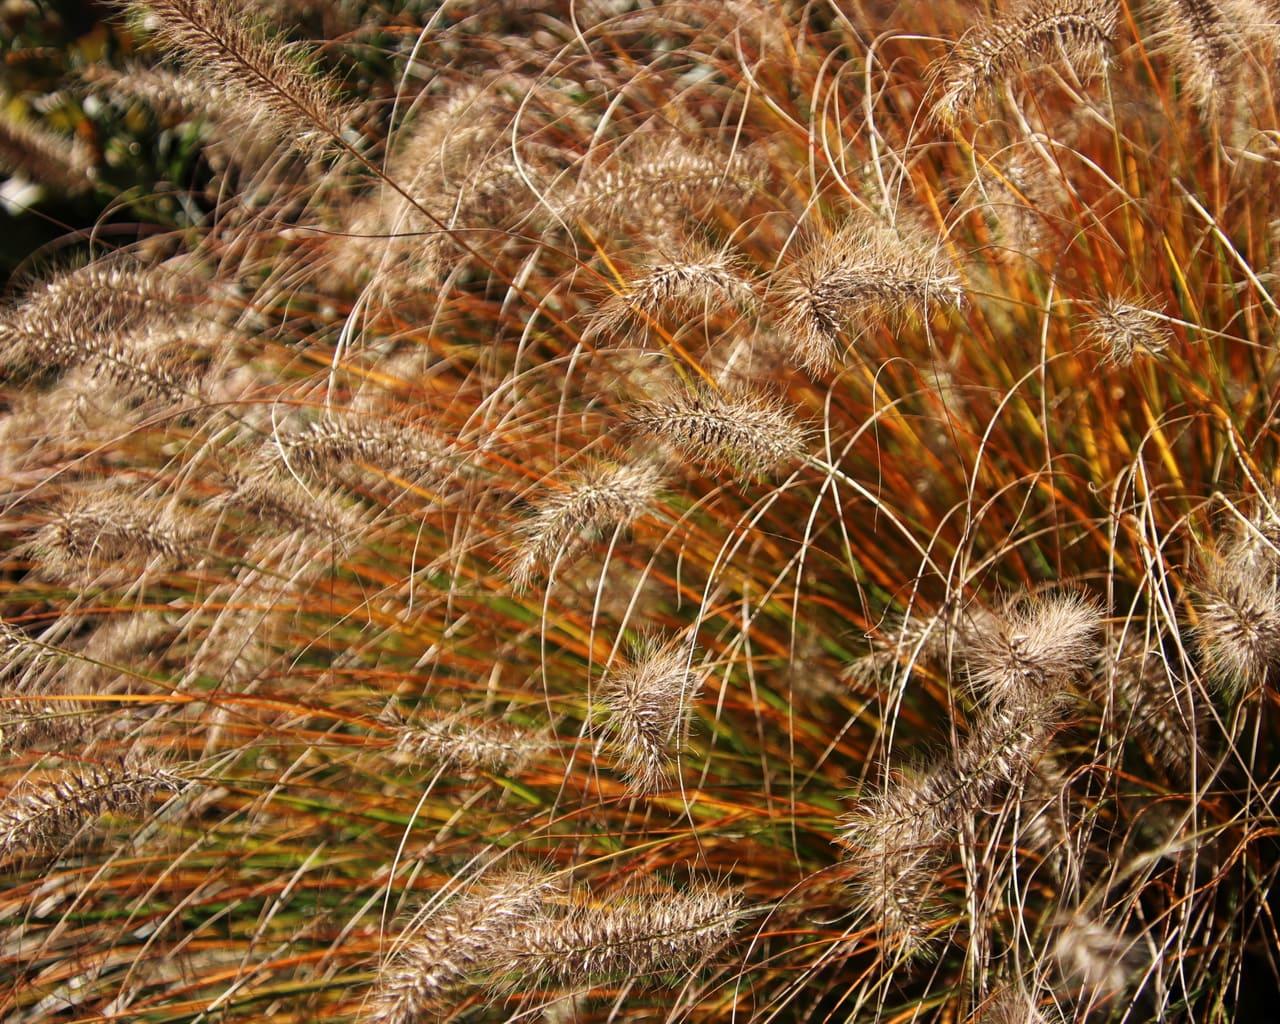 Herbstfärbung des Lampenputzergrases, Pennisetum alopecoroides